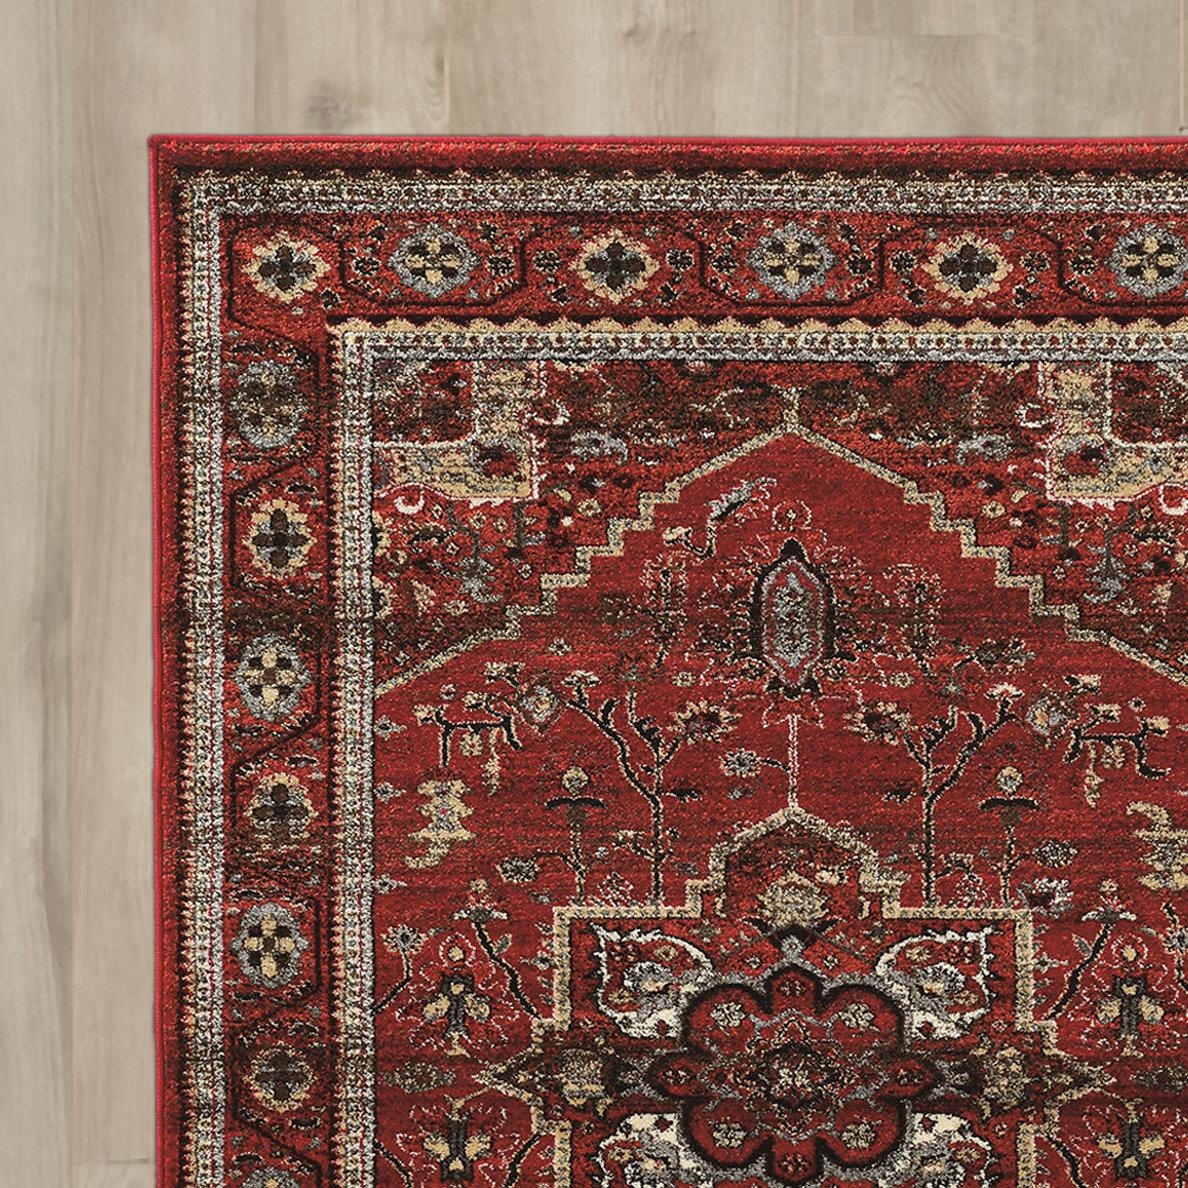 bloomsbury market shelie red gray beige area rug wayfair. Black Bedroom Furniture Sets. Home Design Ideas